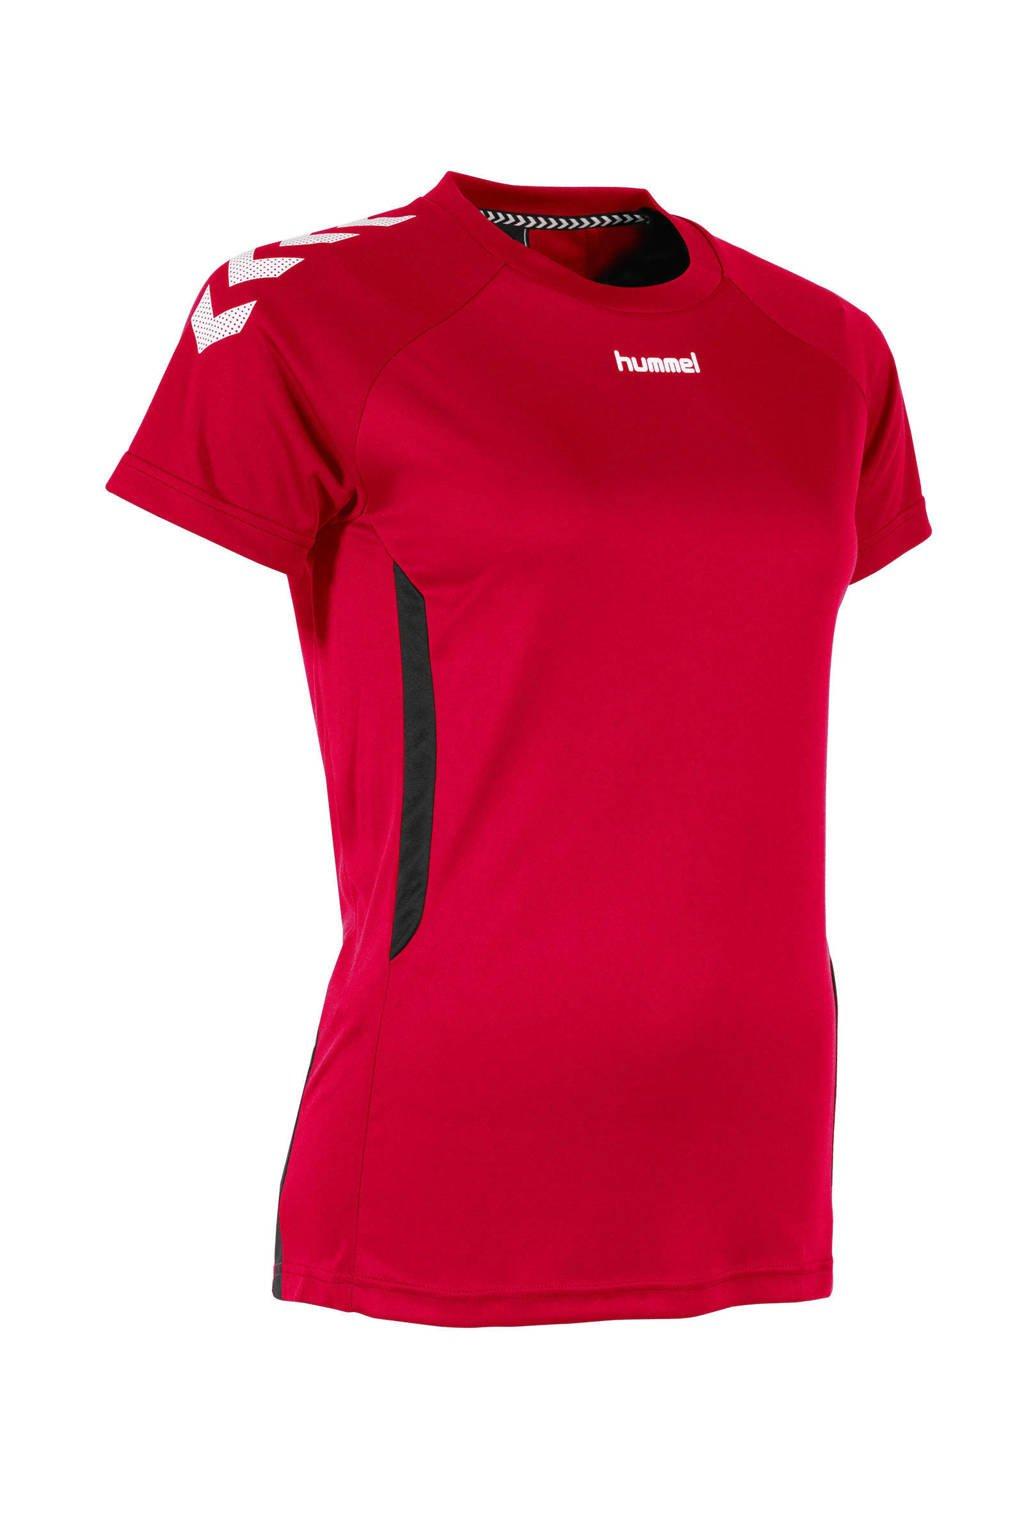 hummel voetbalshirt rood, Rood